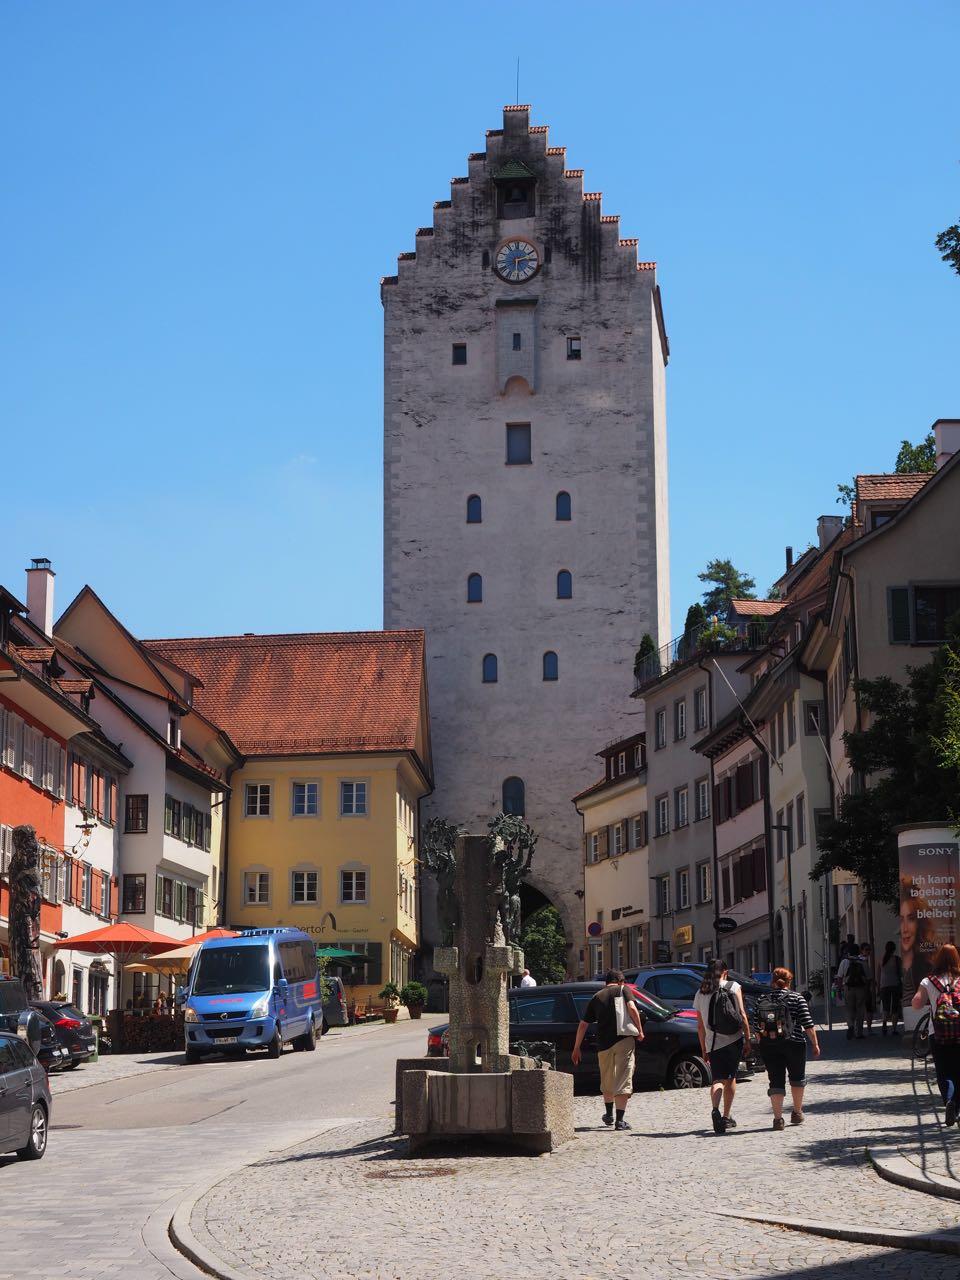 Ravensburger Spielemuseum